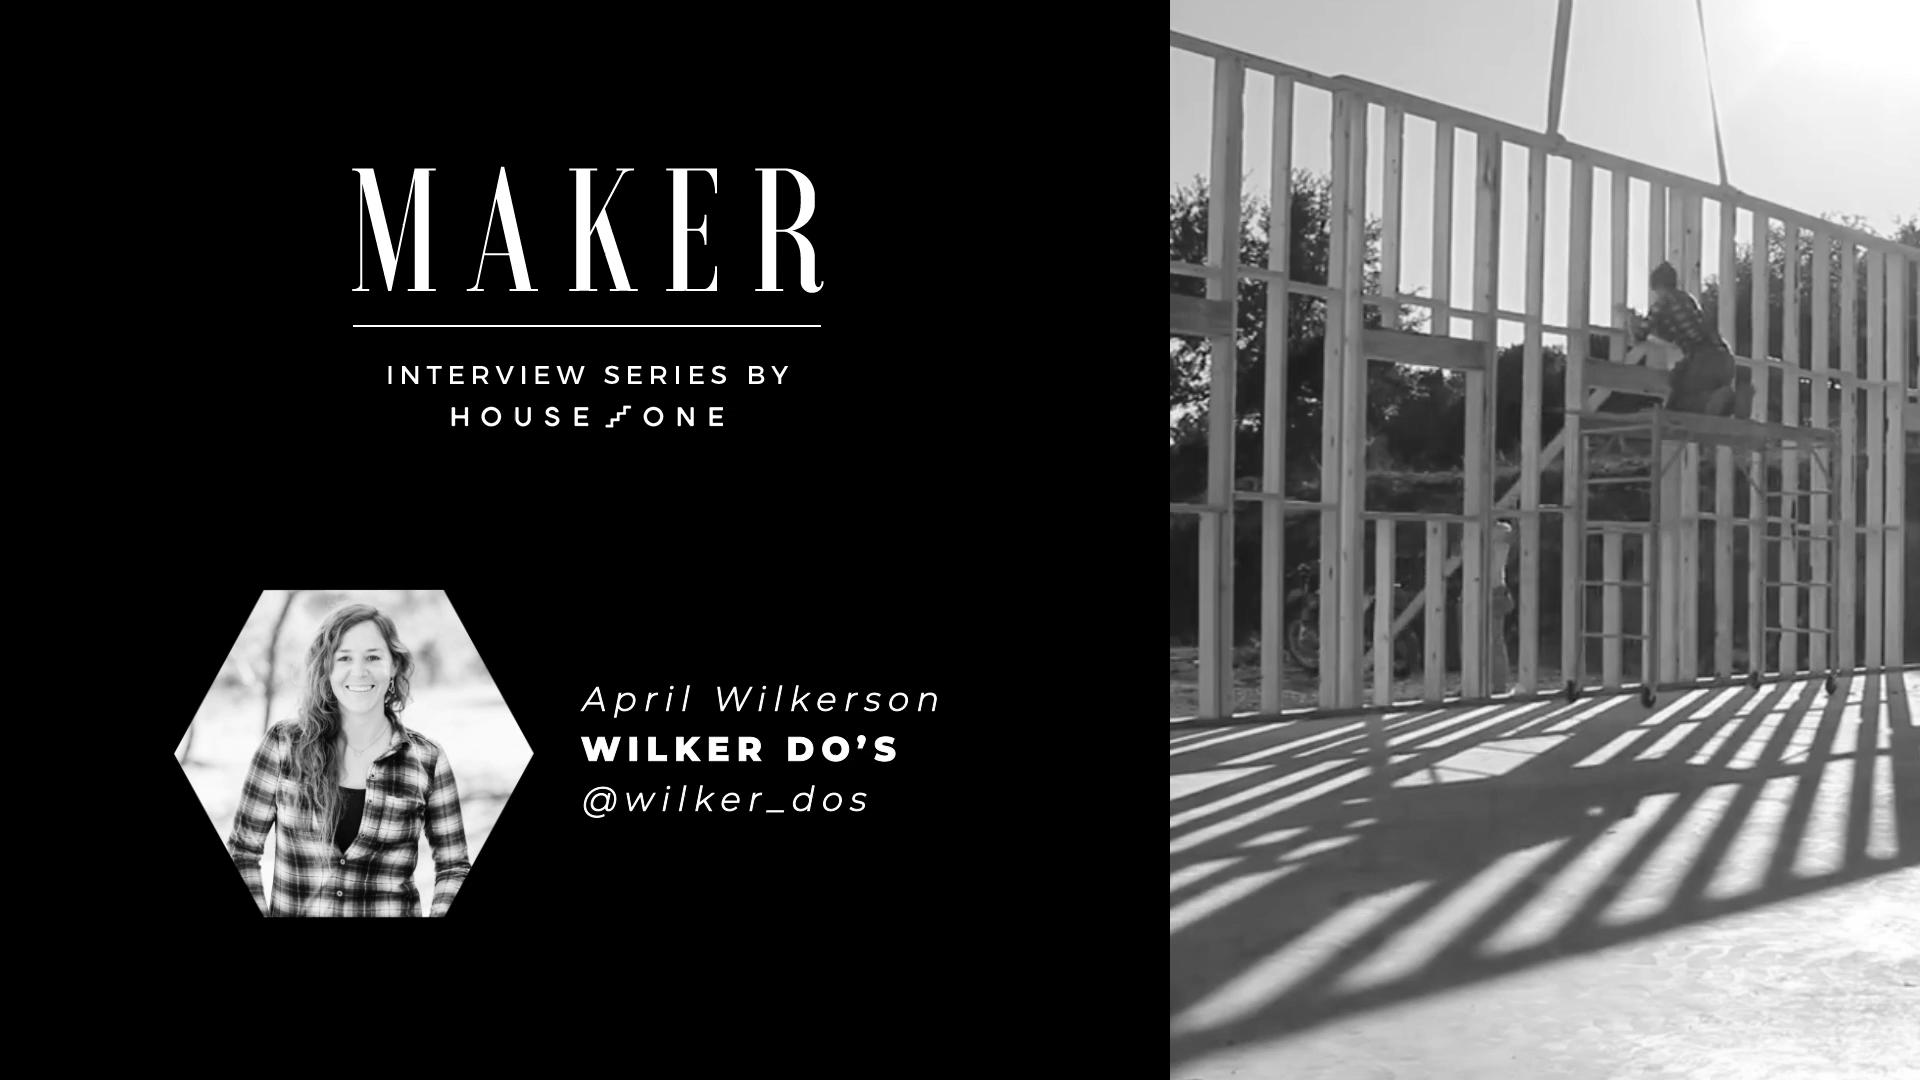 April Wilkerson of Wilker Do's